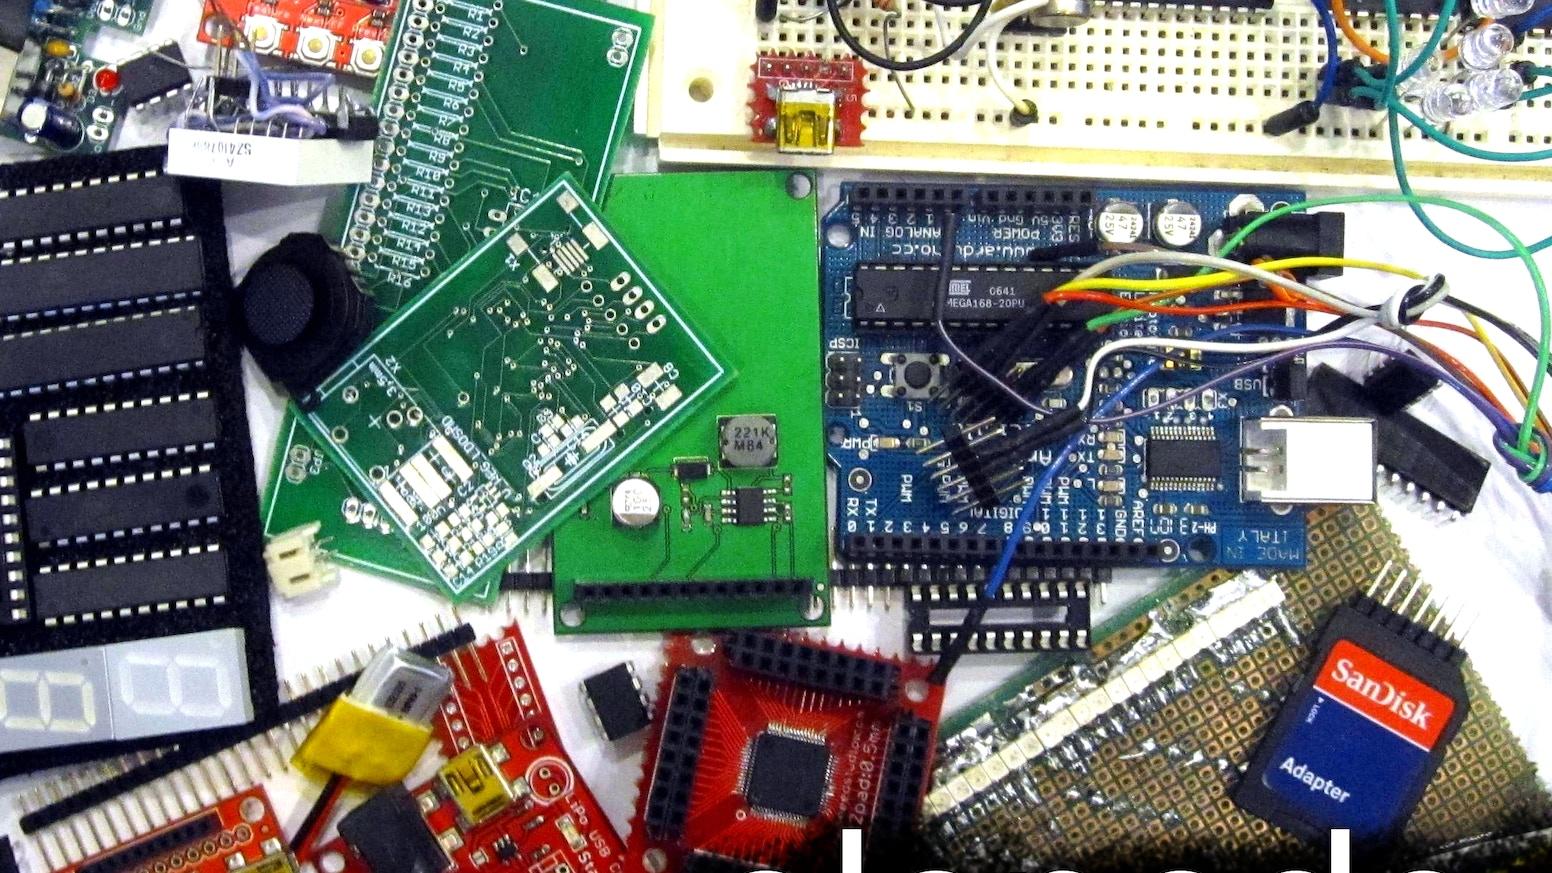 olopede educational electronics kits by zach banks josh